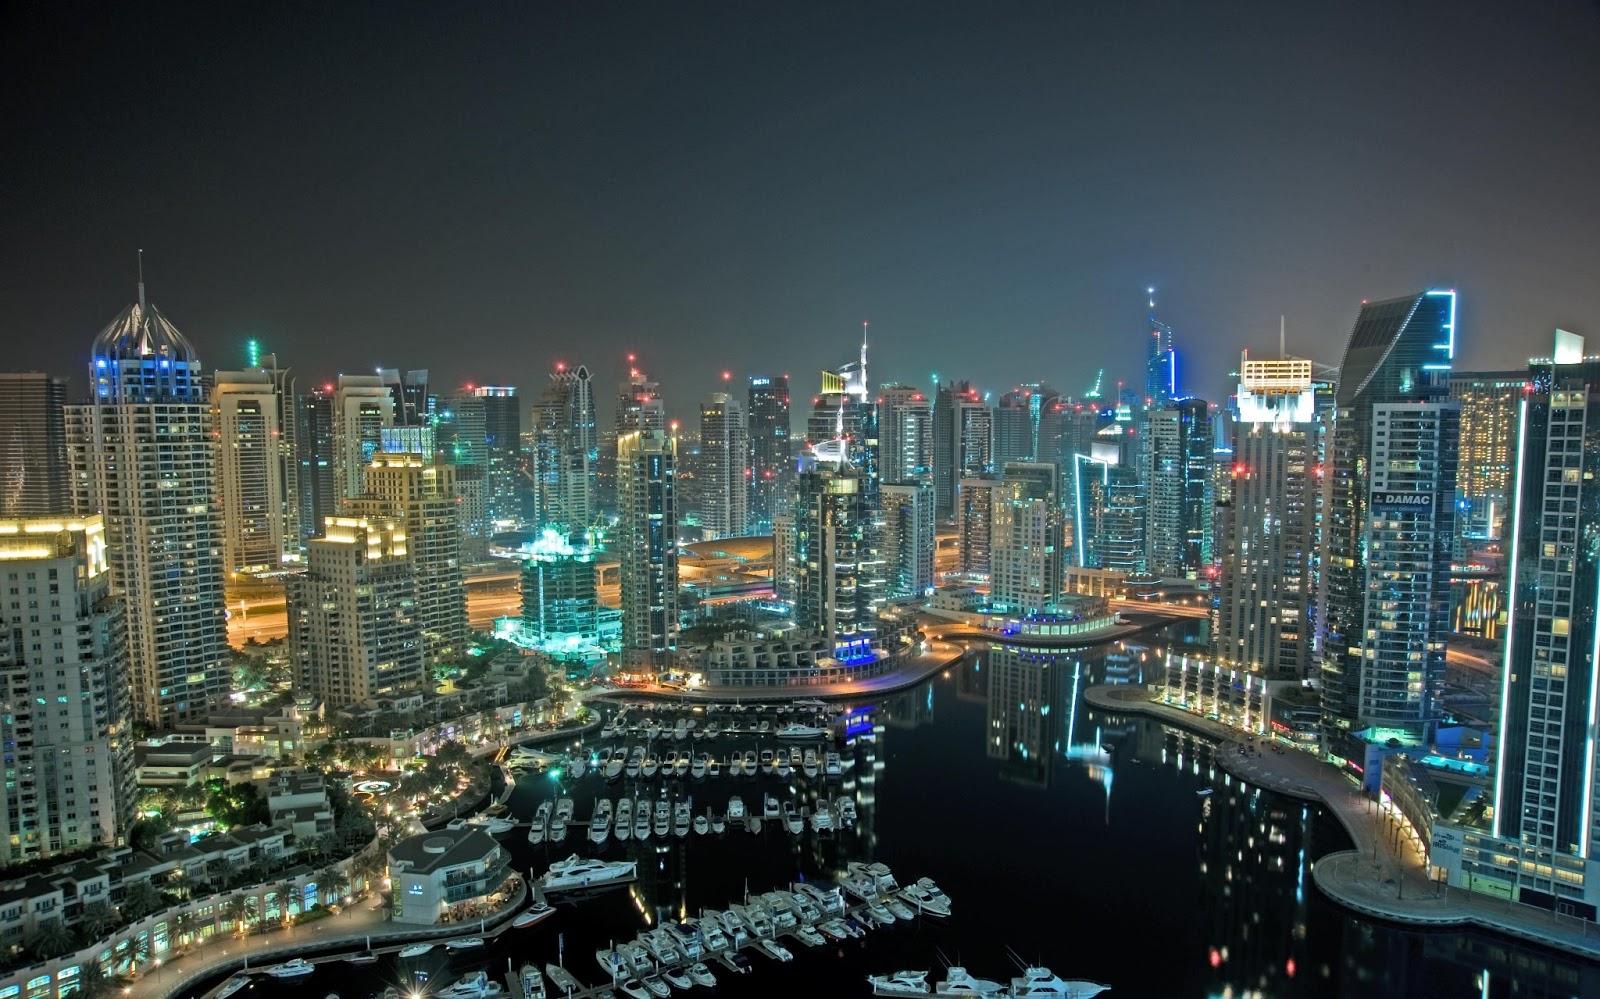 Dubai HD Wallpapers HD Wallpapers 360 1600x999